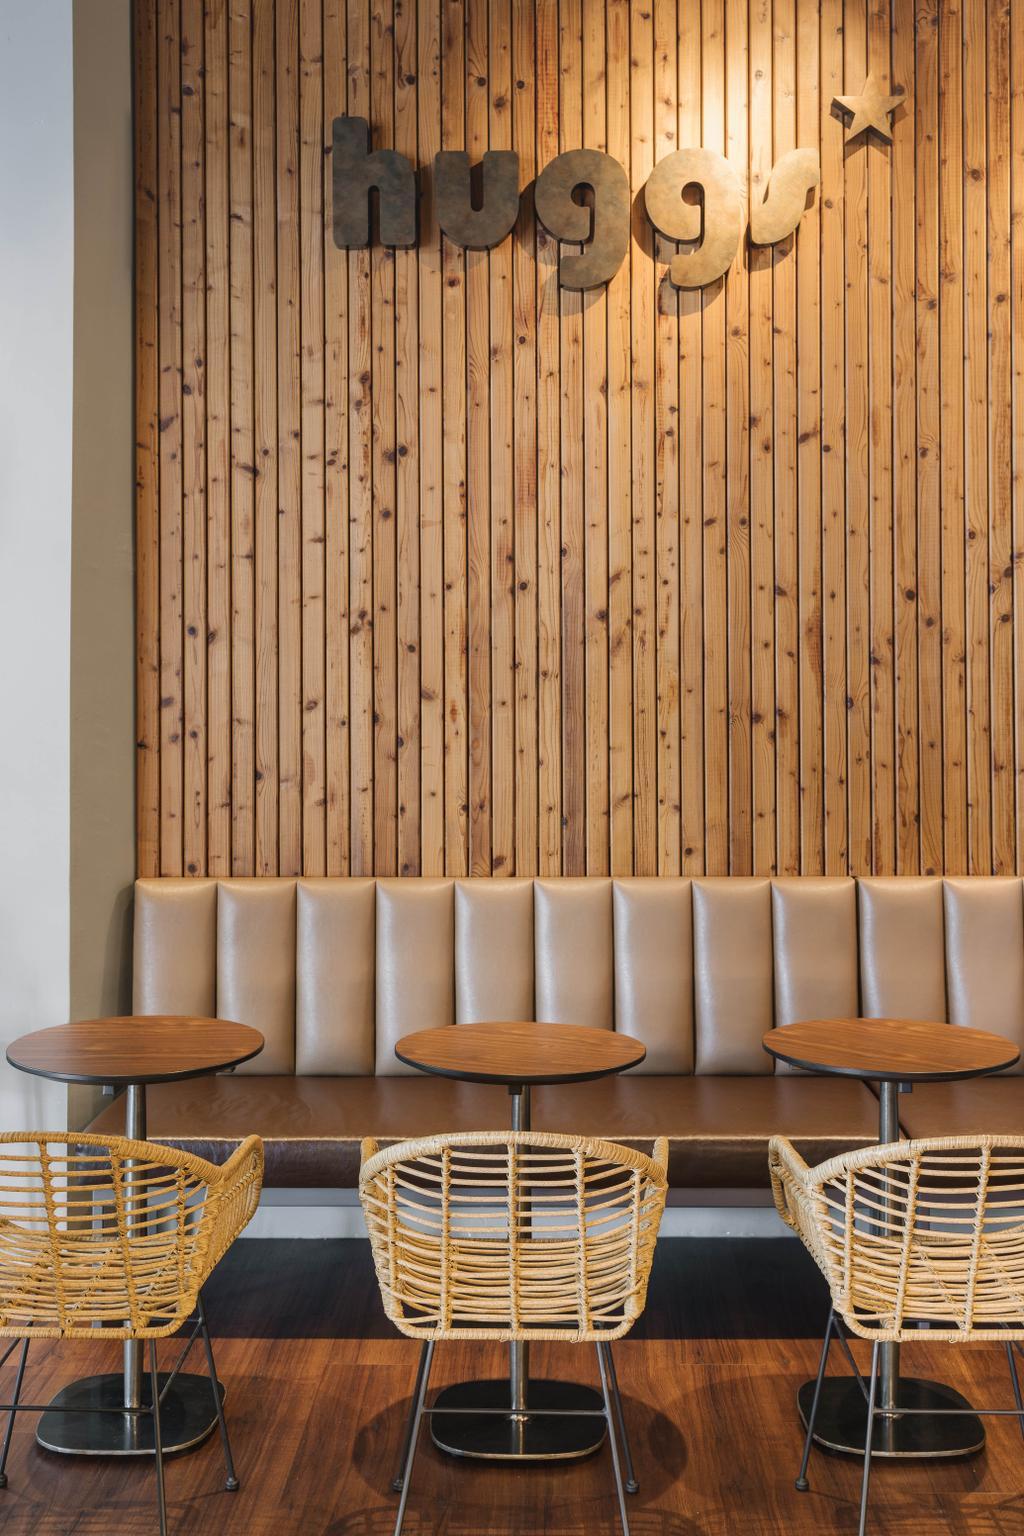 Huggs Coffeebar @ Millenia Walk, Commercial, Interior Designer, LS2 Design & Construction, Contemporary